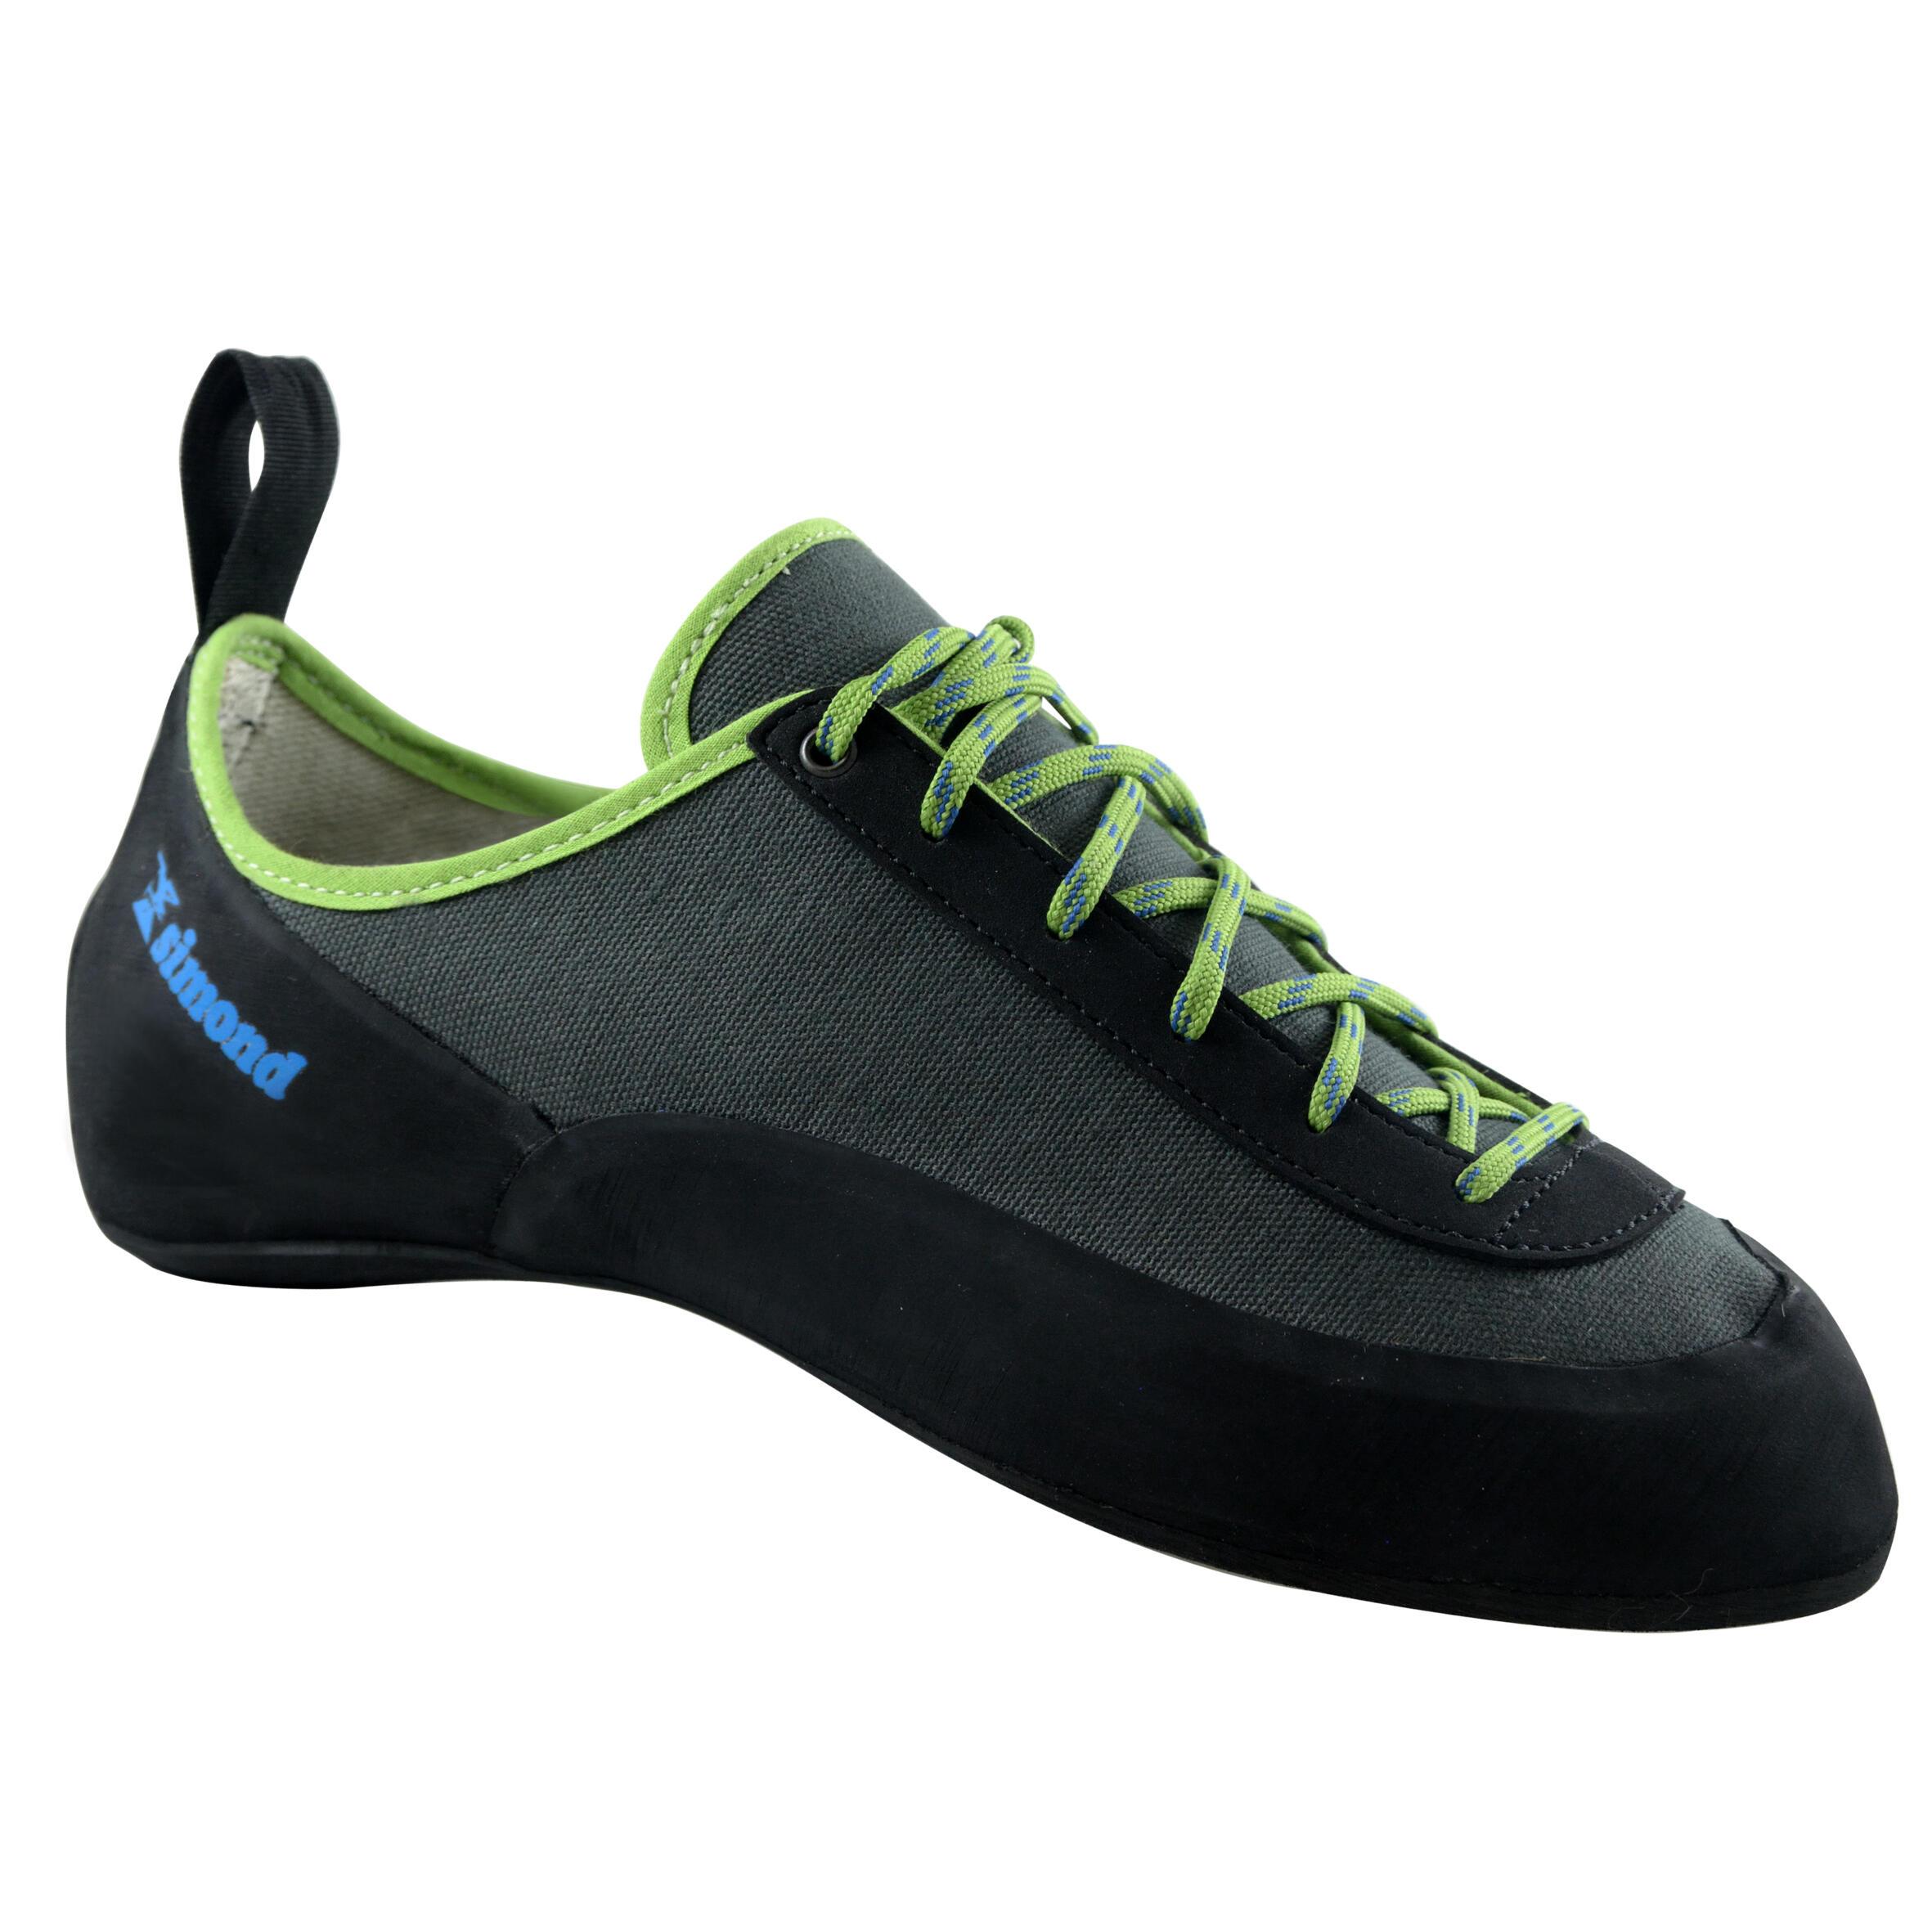 Buy Rock Climbing Shoes Online